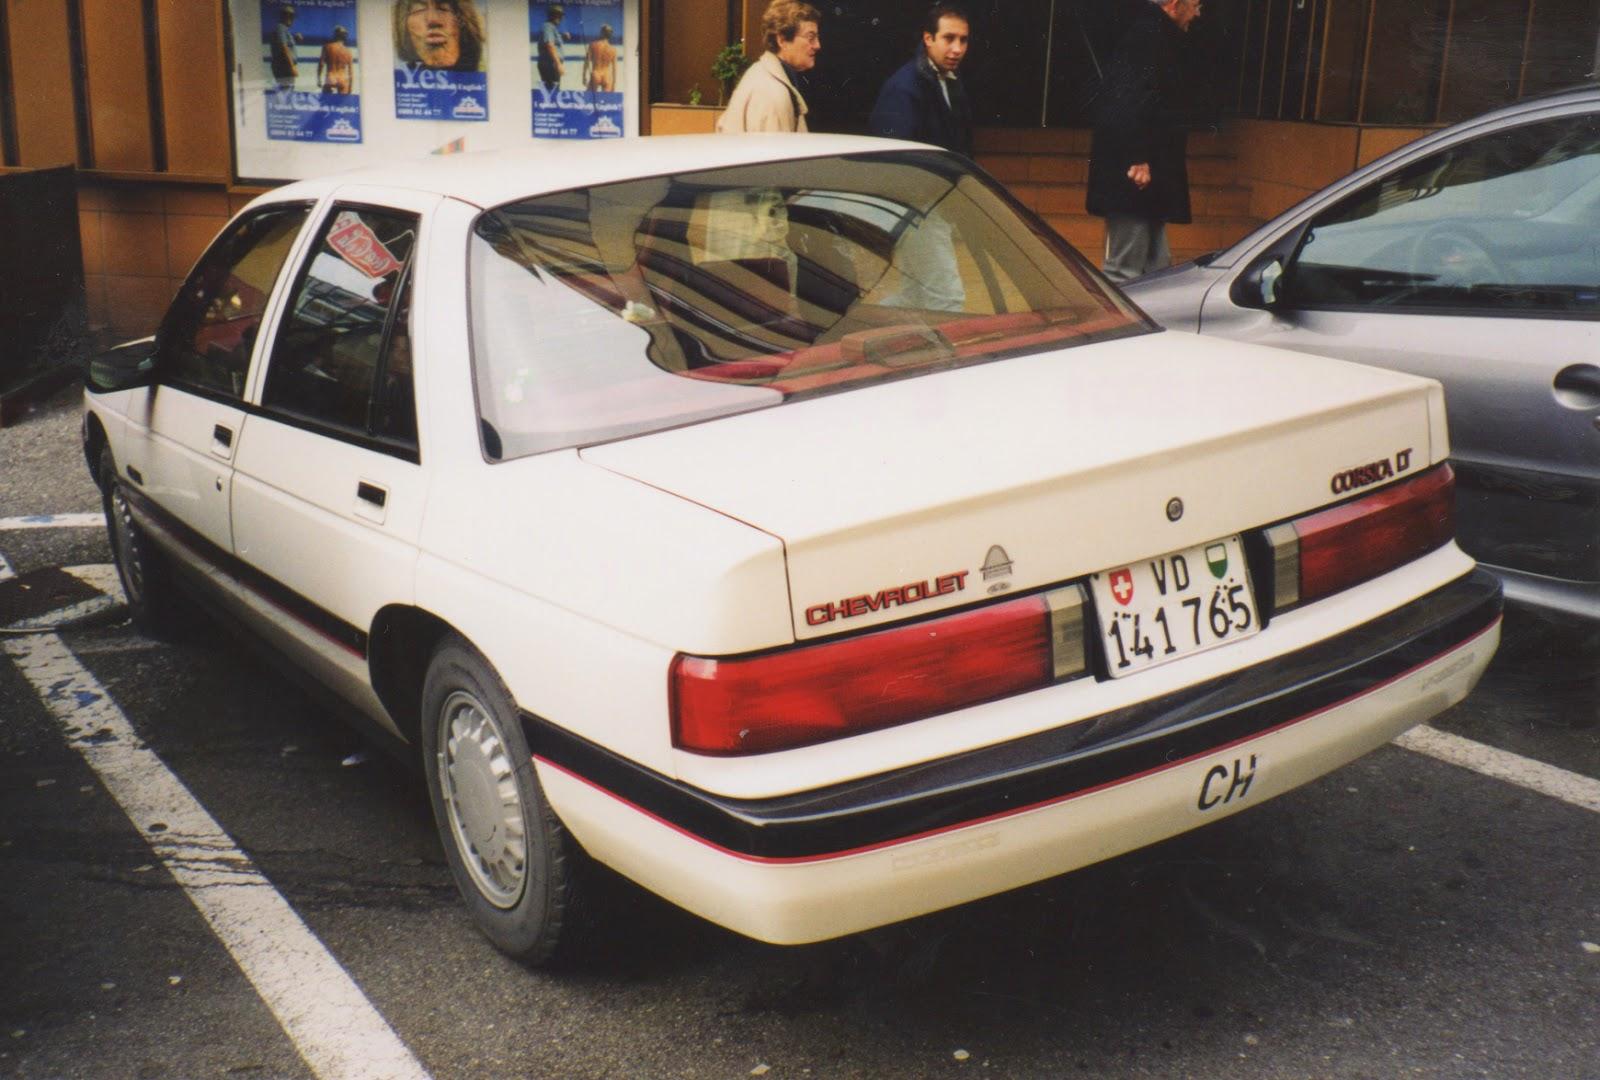 All Chevy 94 chevy corsica : 1987-1989 Chevrolet Corsica LT,Vevey, Switzerland | SPOT A CAR